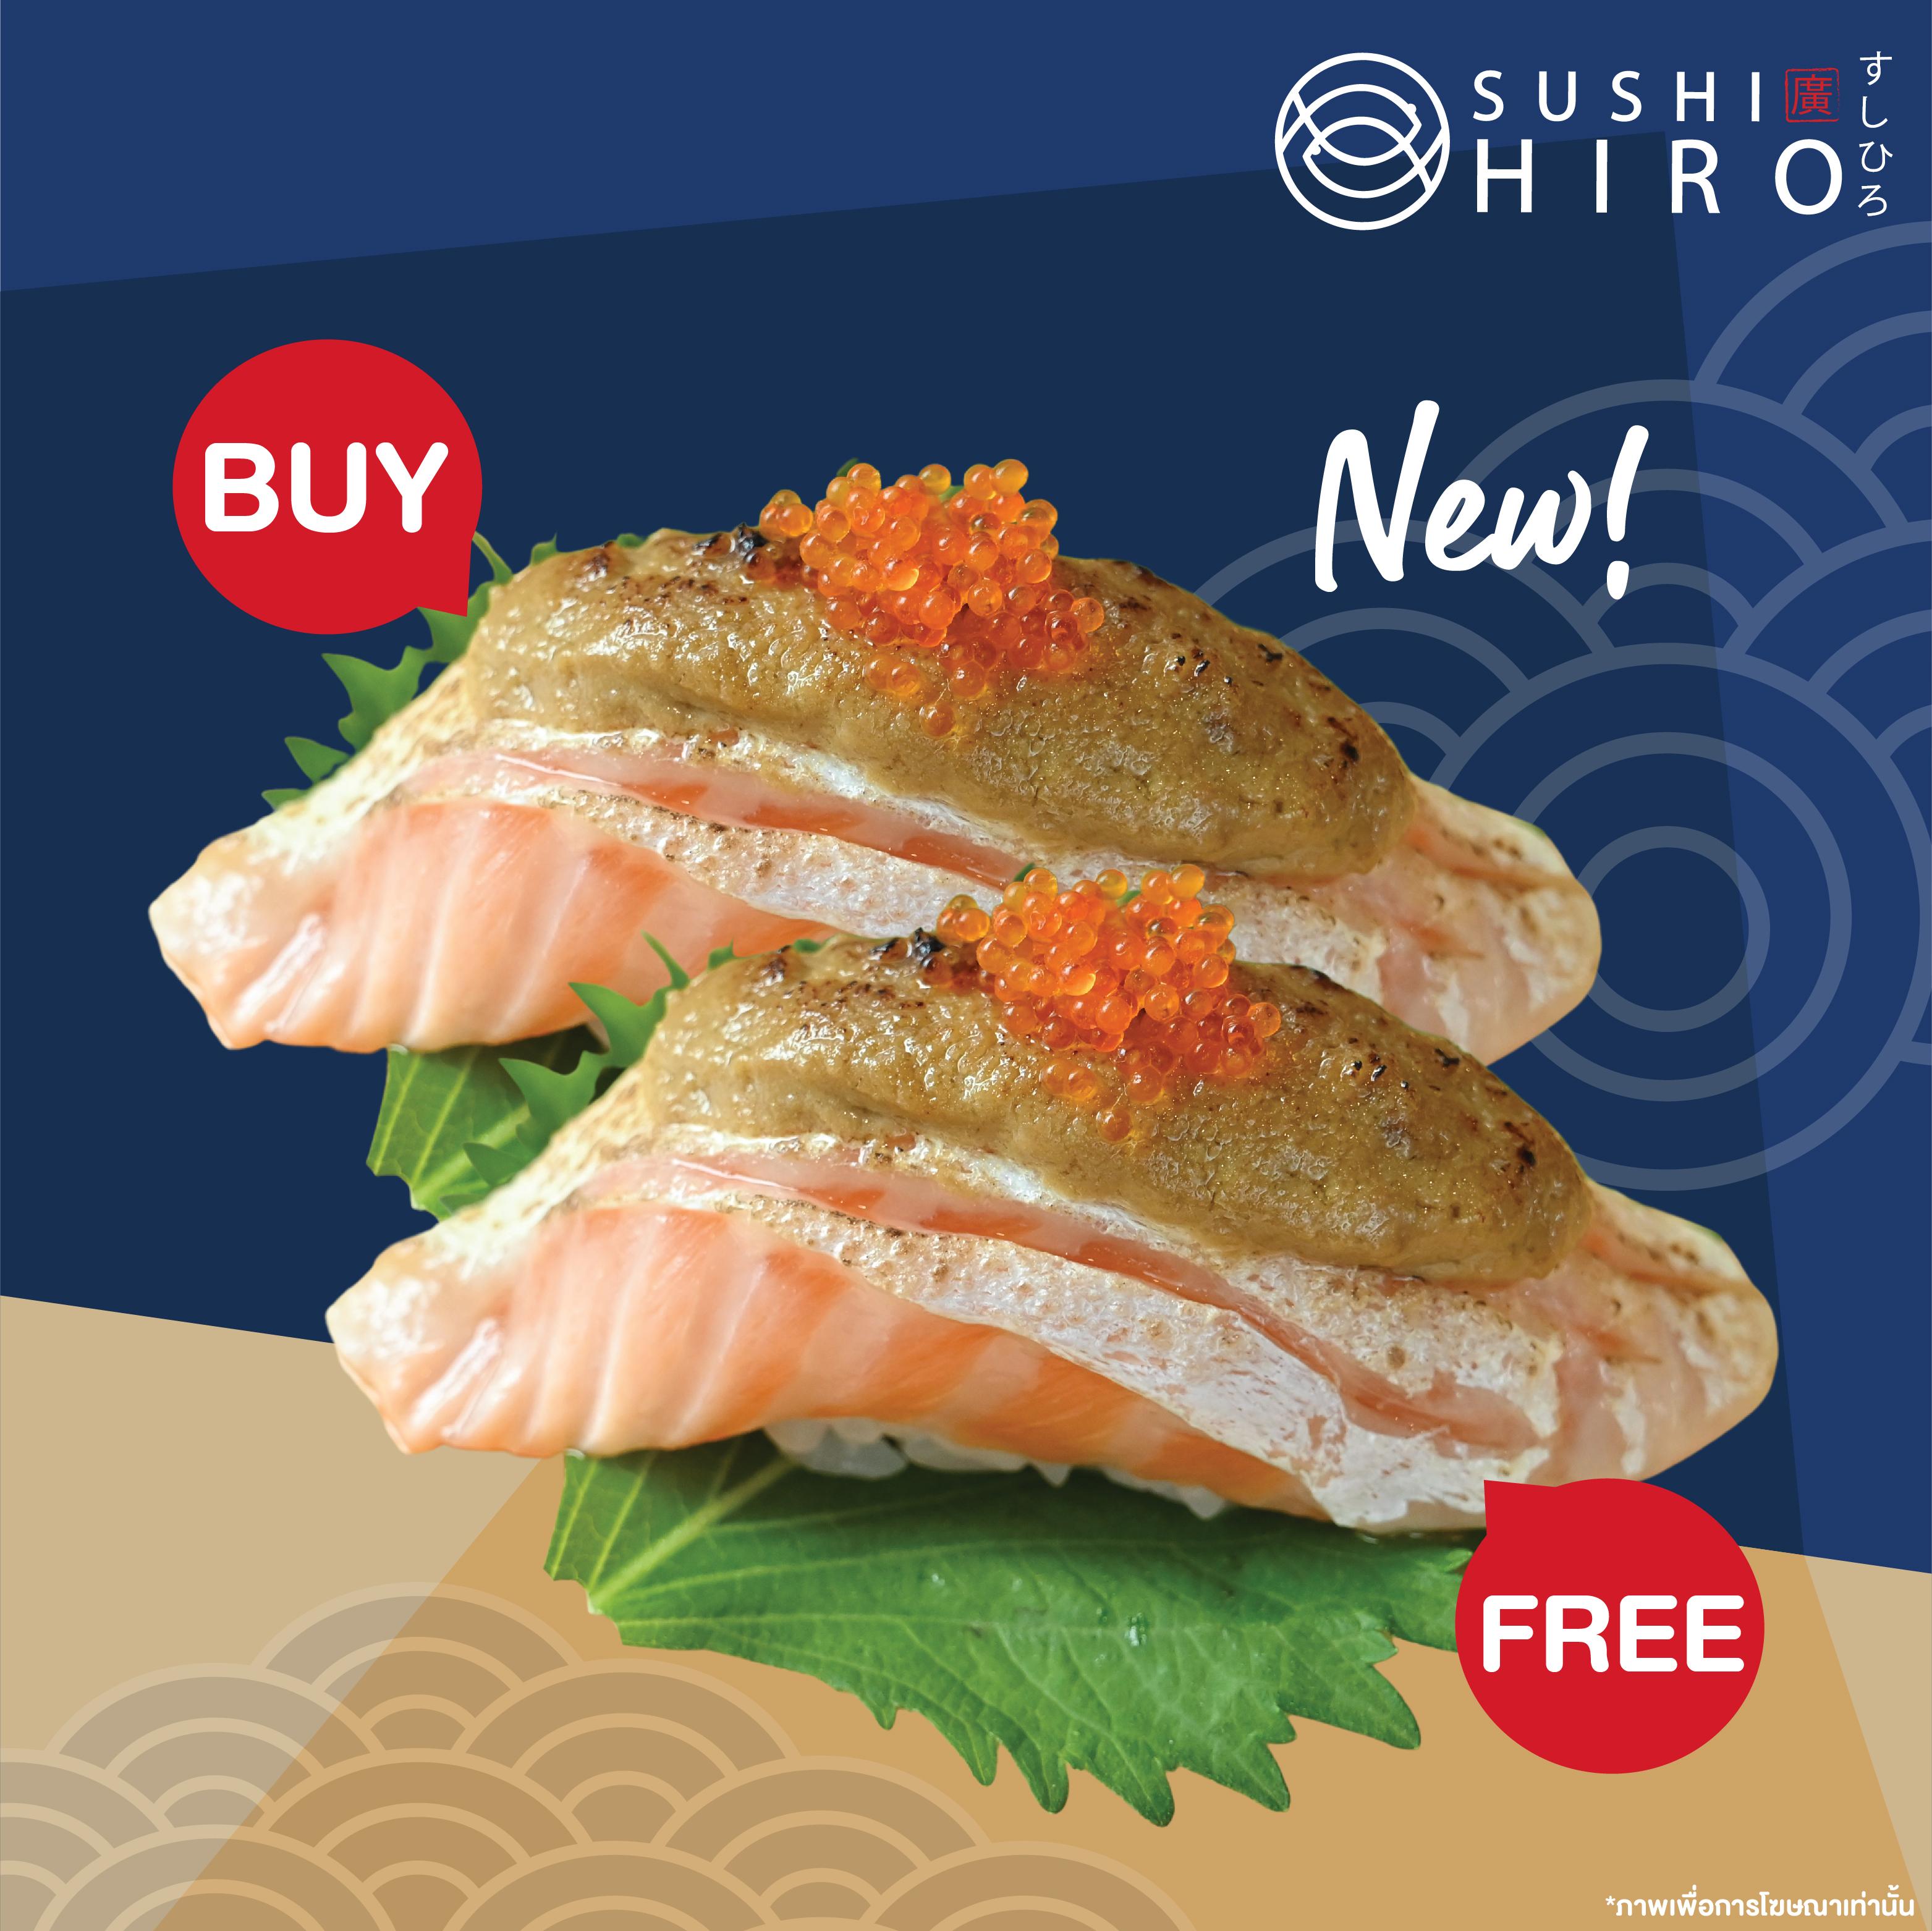 [ 1 Free 1 ] New! Salmon Toro FoieGrasLava Sushi